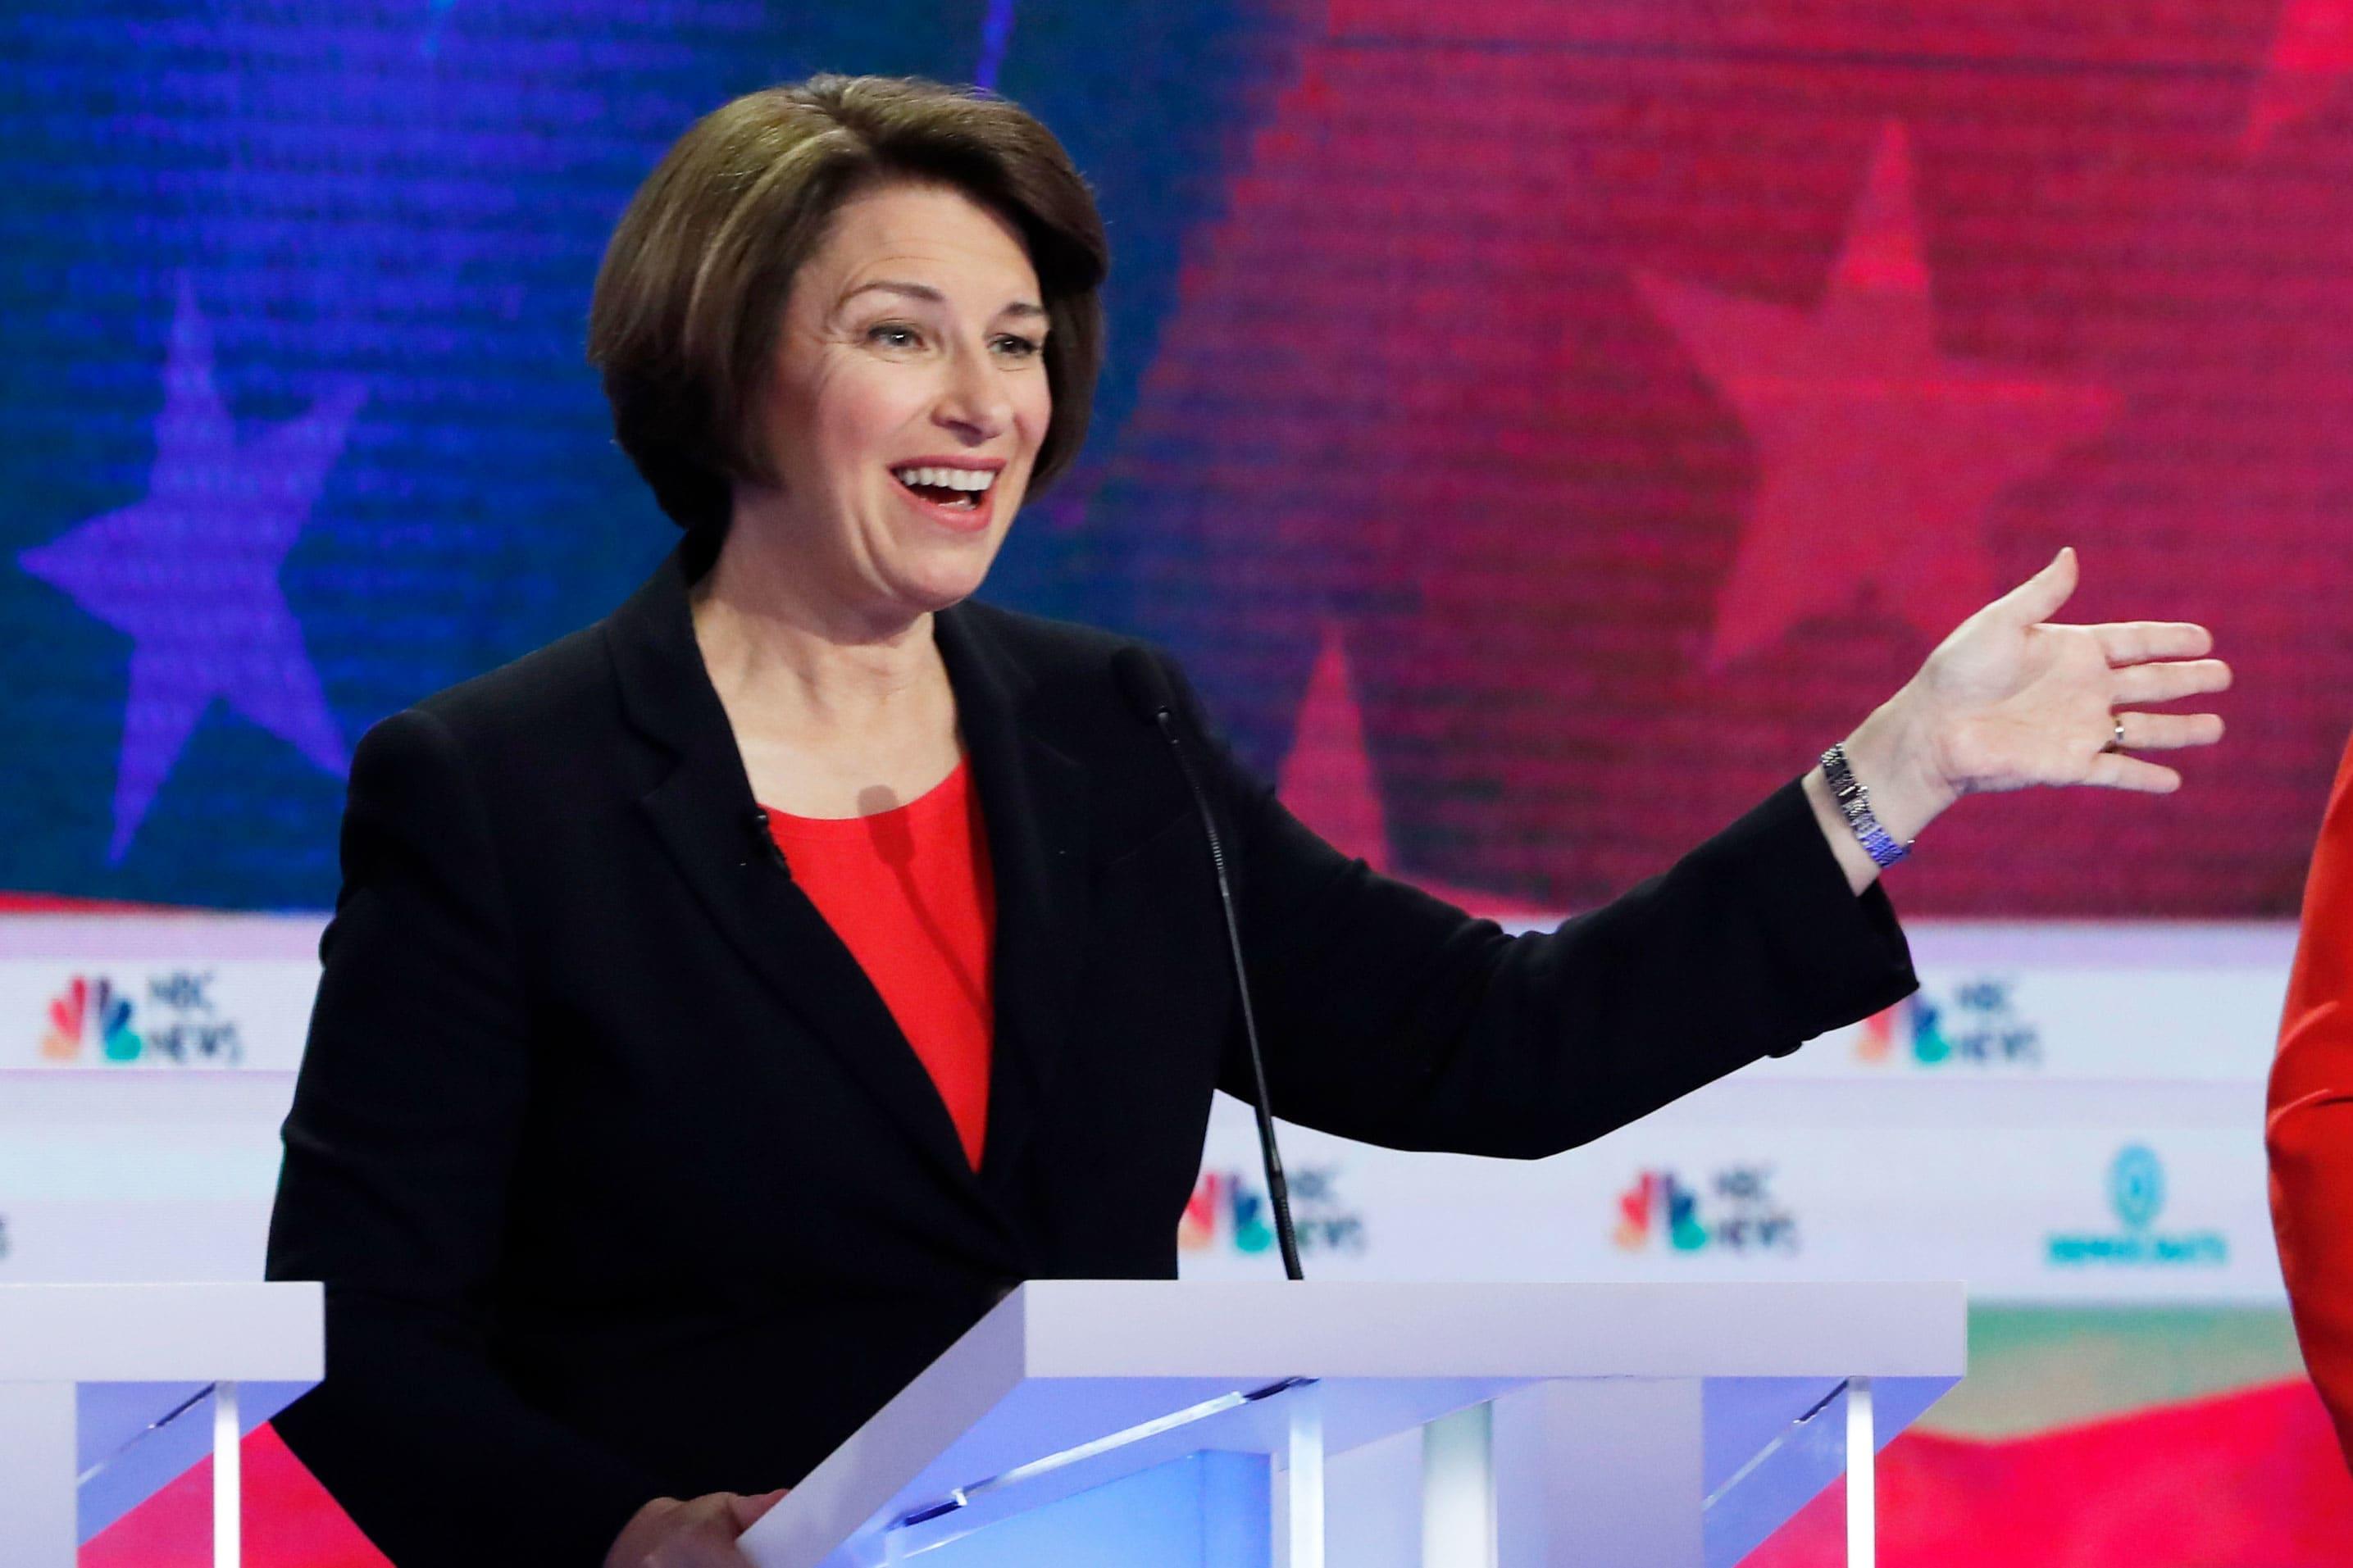 Debate fact check: Firm says Sen. Klobuchar overstates Trump's lack of success lowering drug prices